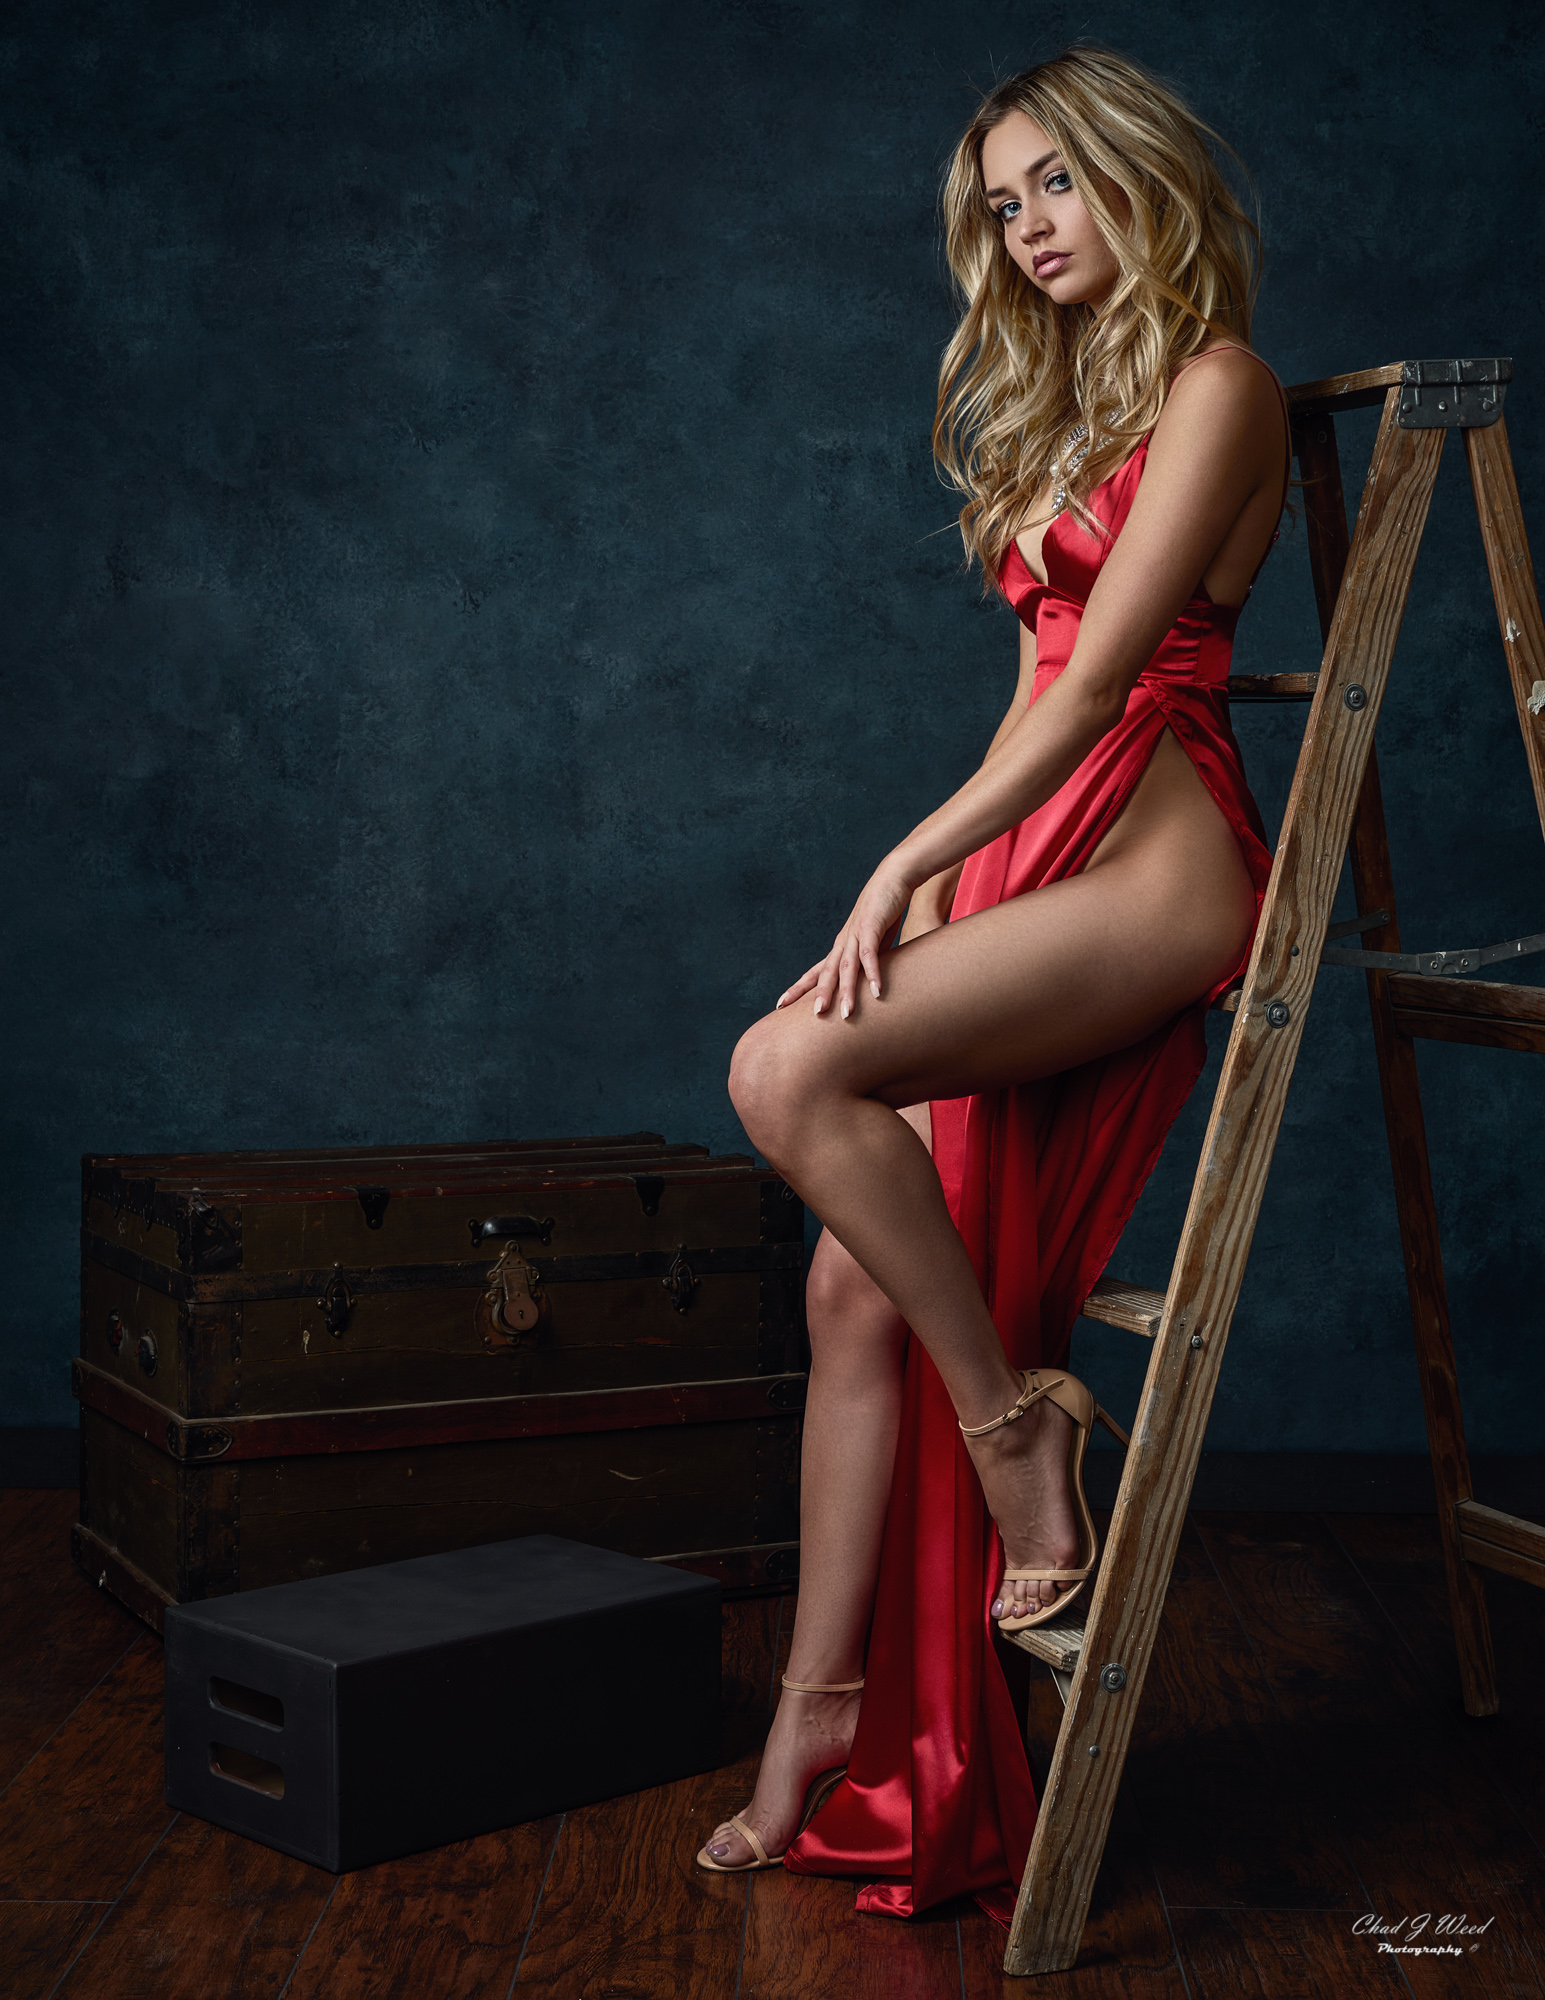 Beauty Model Shea by Arizona Beauty Photographer Chad Weed